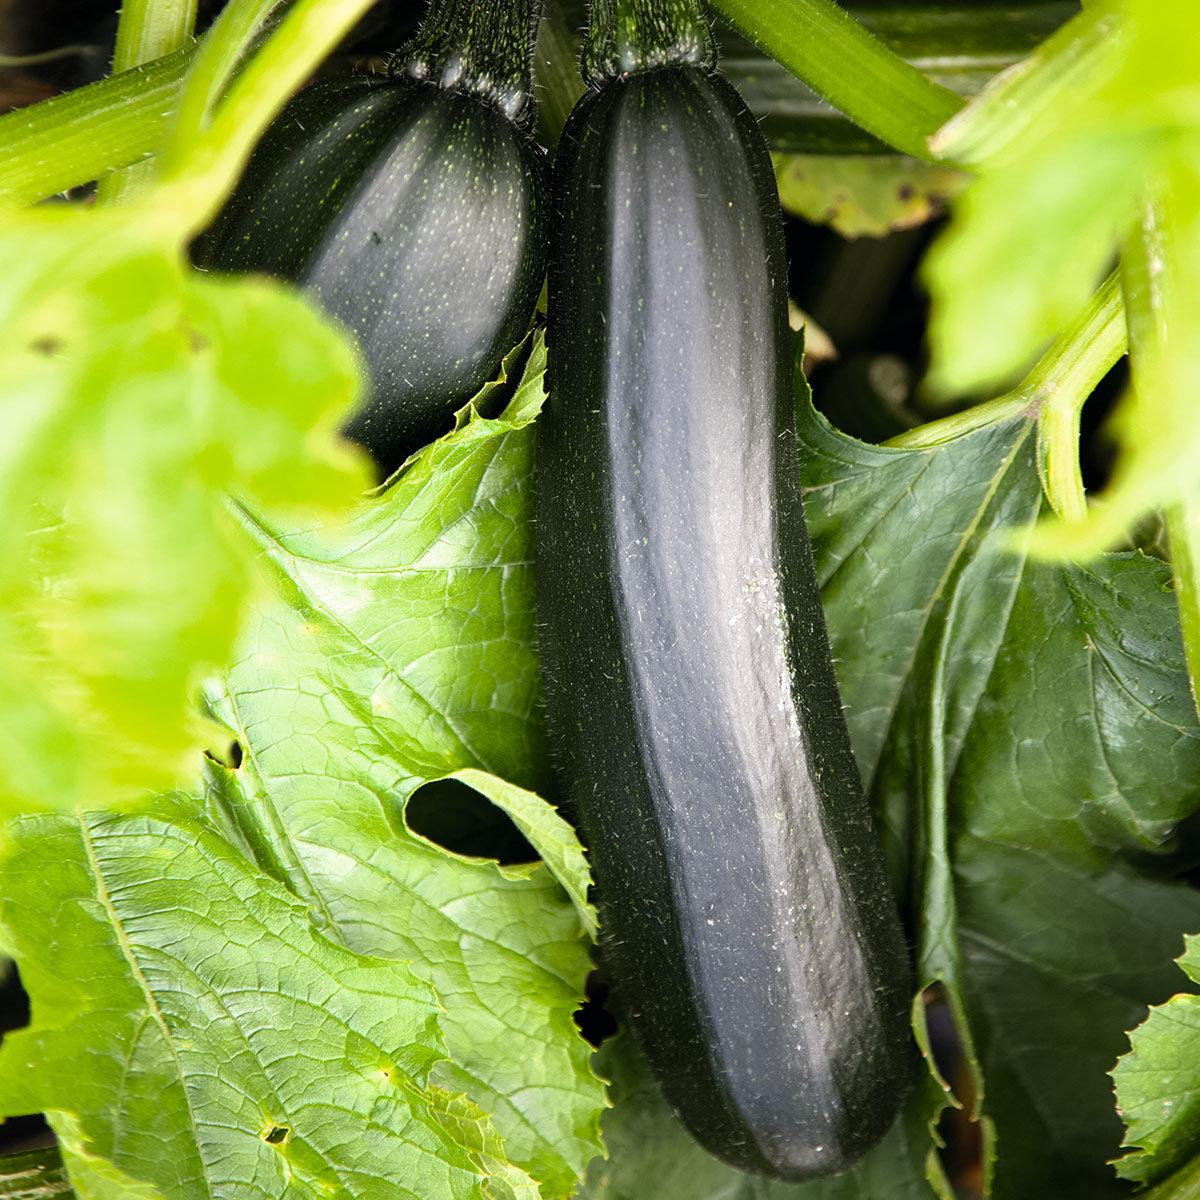 Zucchinisamen Black Beauty | #2